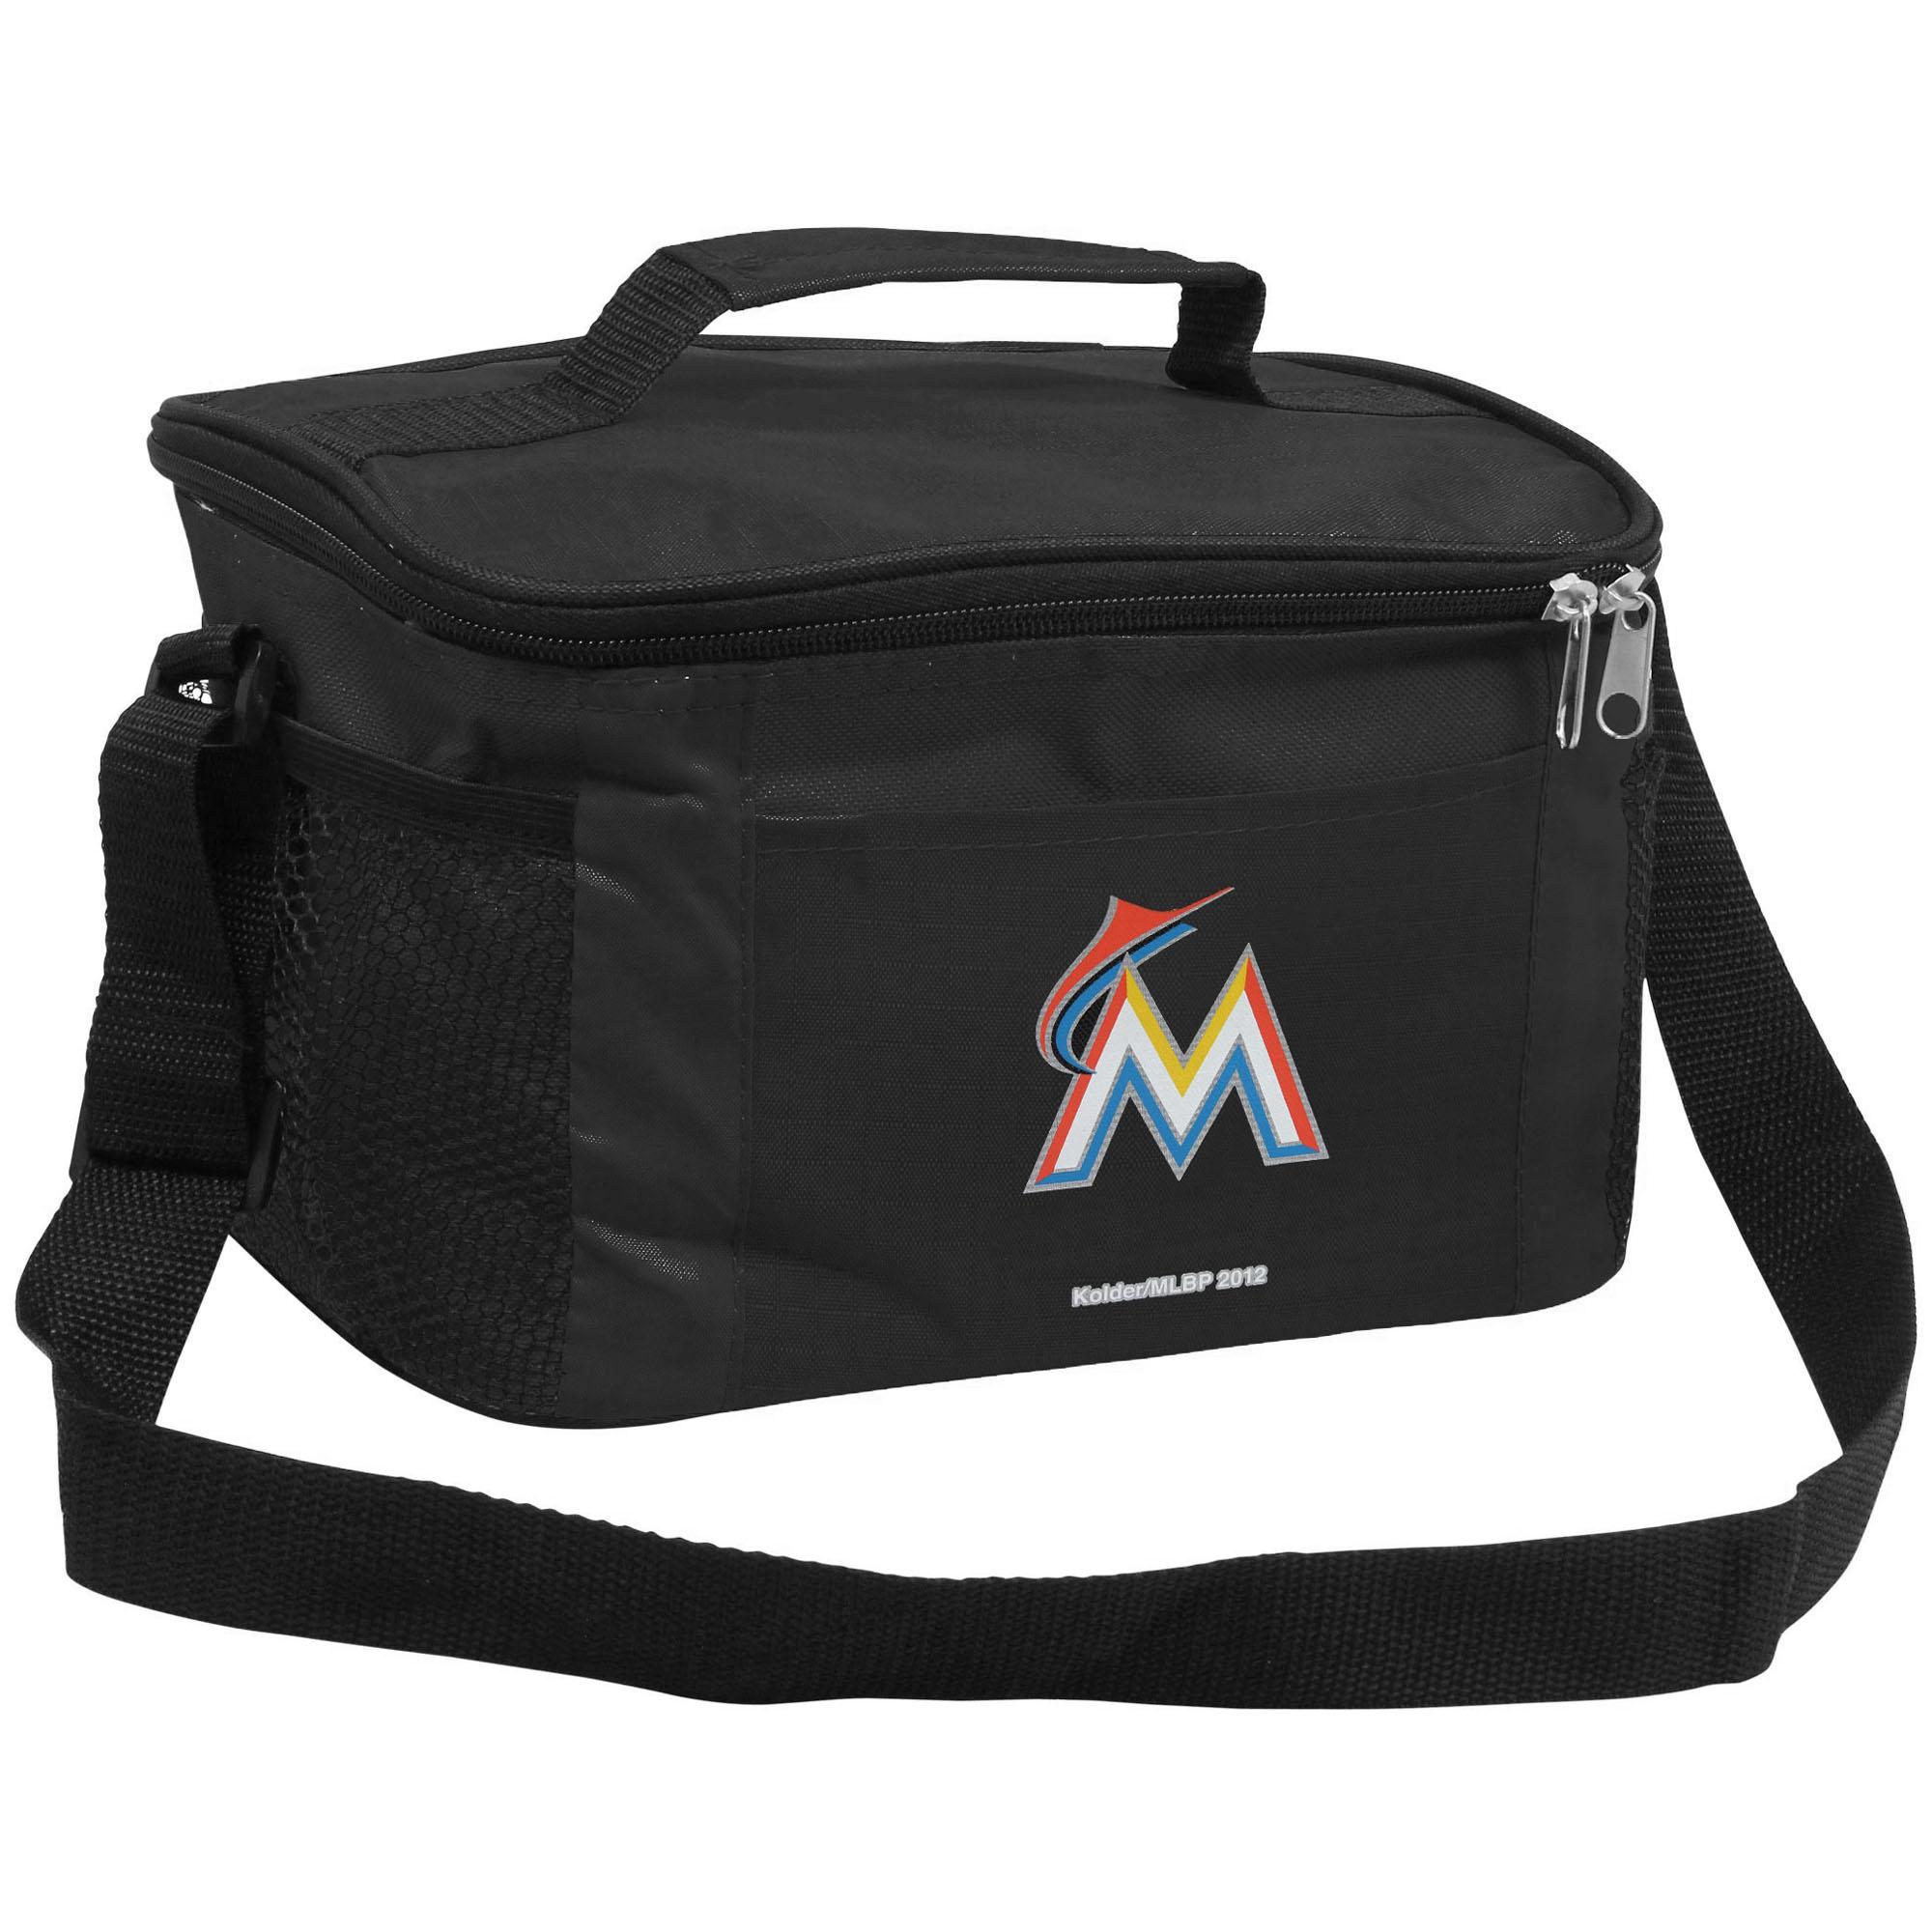 Miami Marlins Black 6-Pack Kooler Tote - No Size